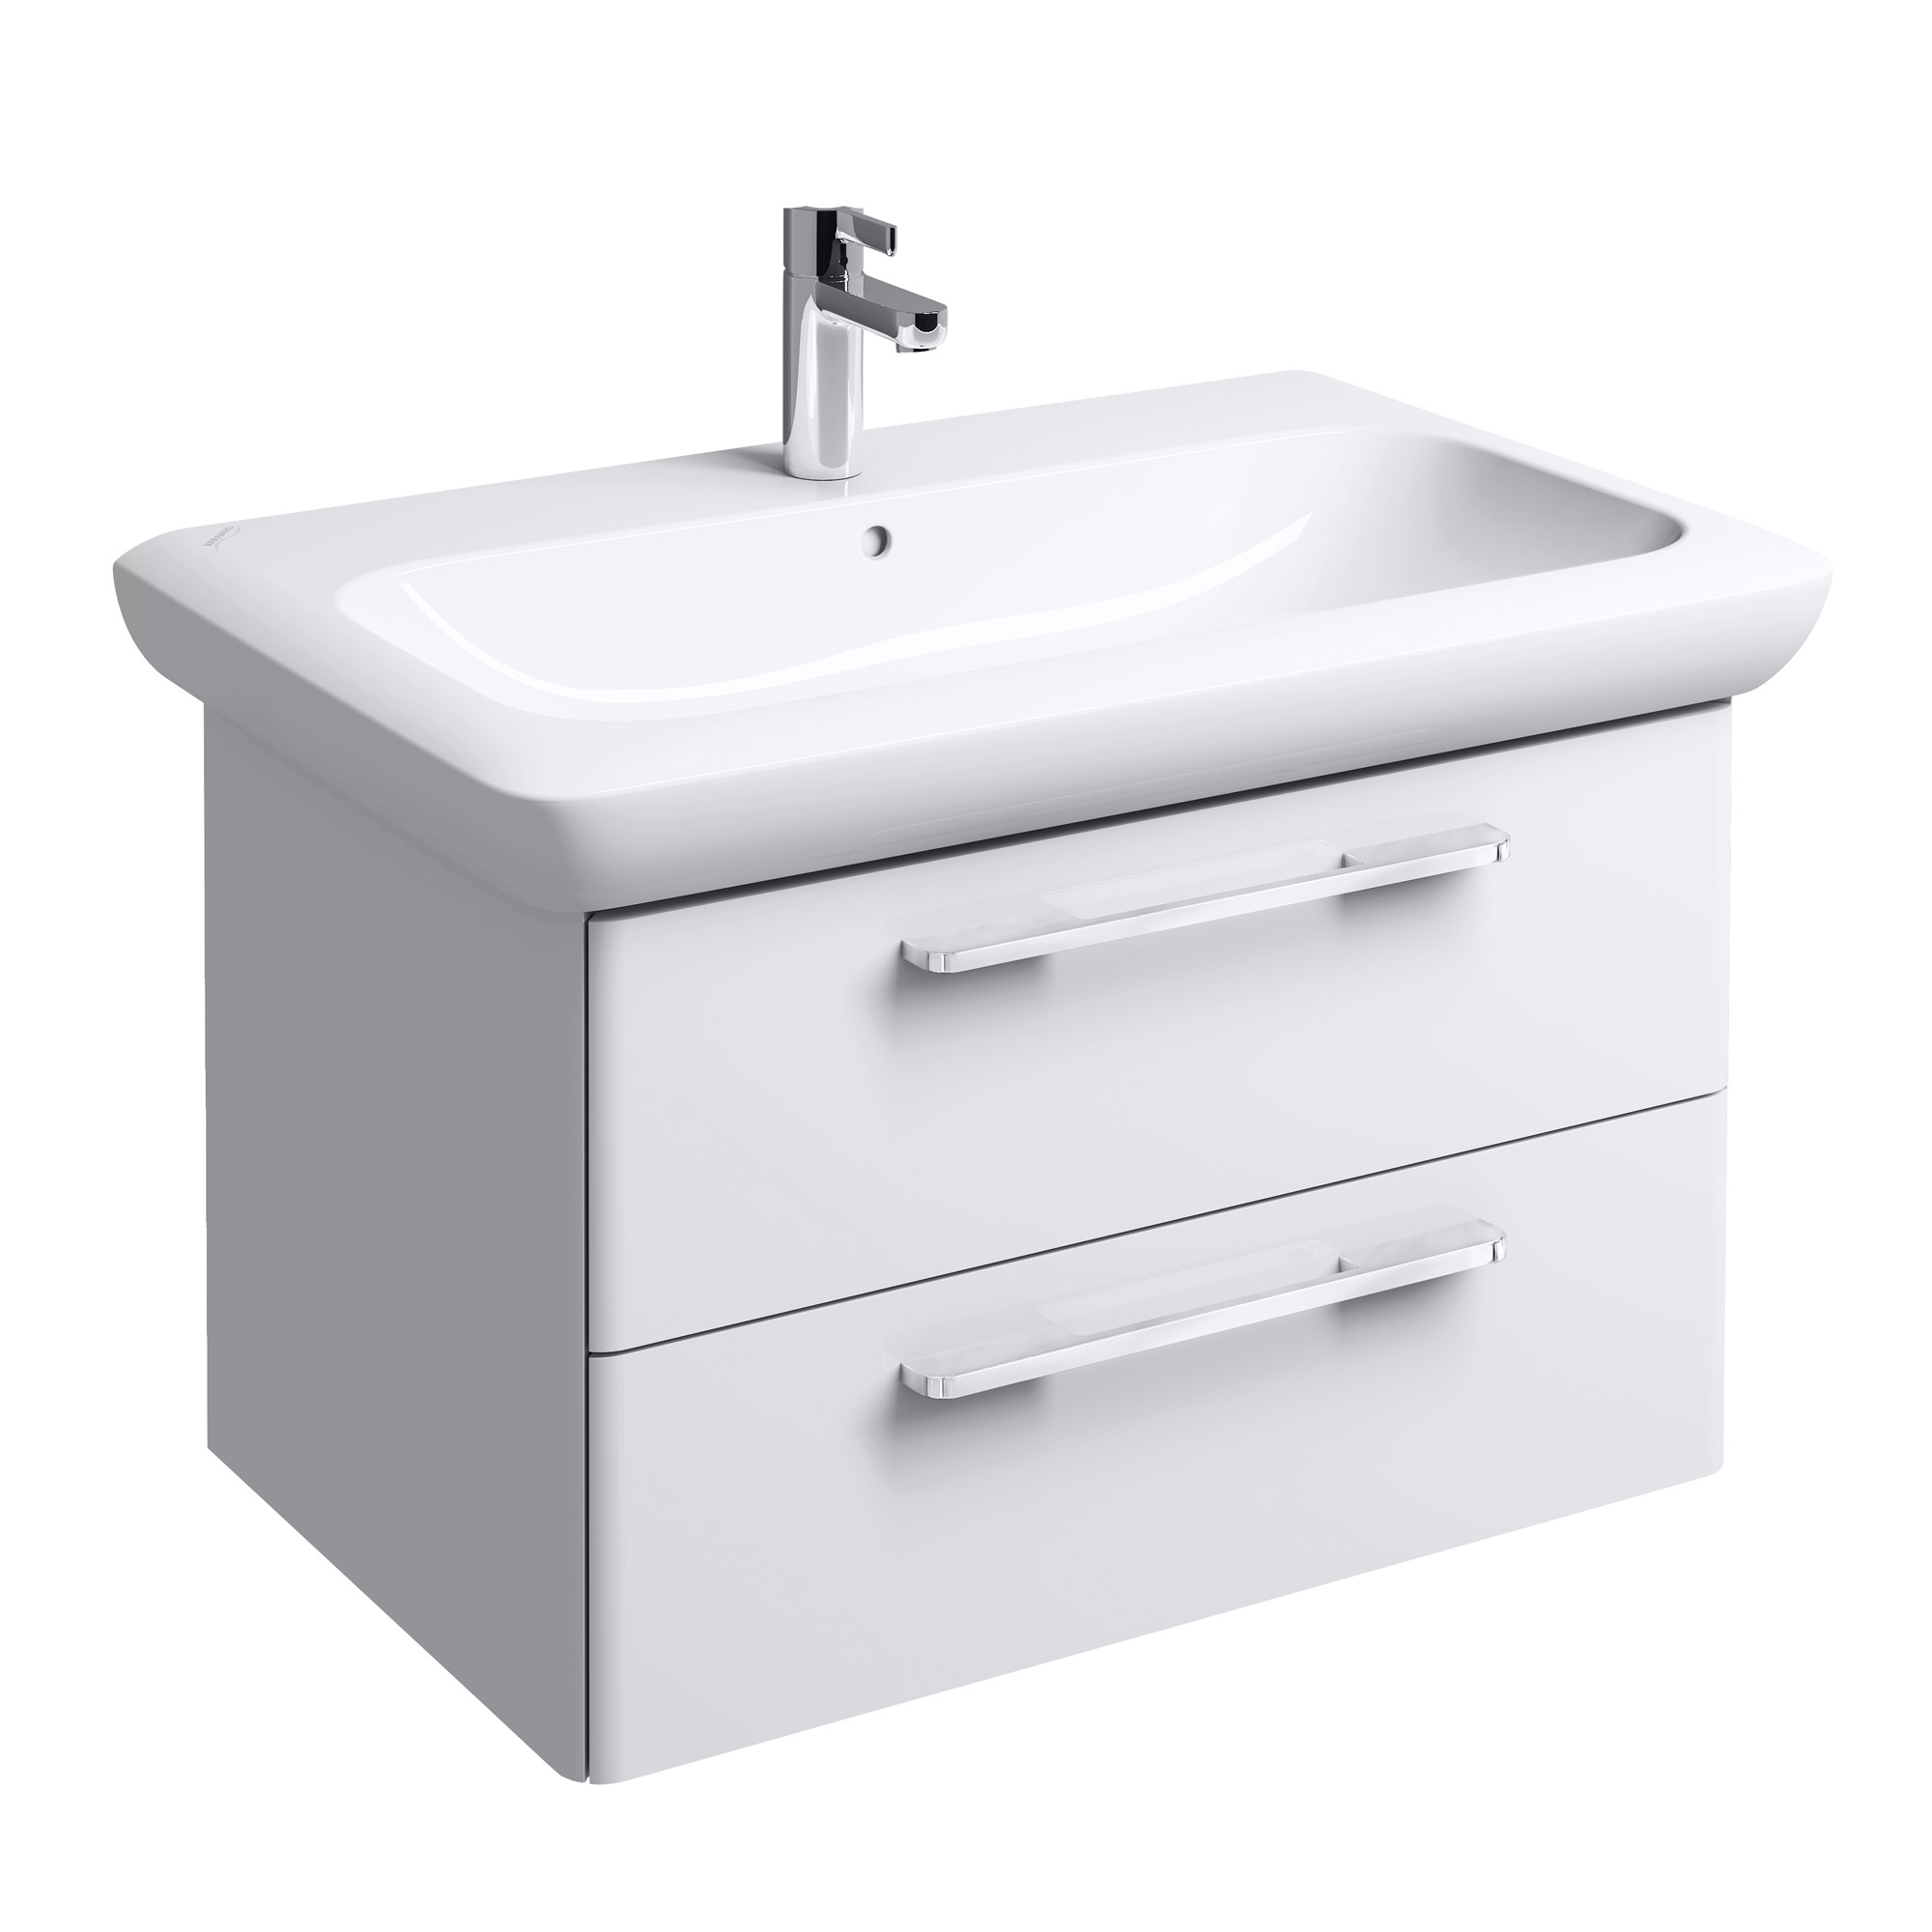 keramag it waschtischunterschrank wei hochglanz 819180000 reuter onlineshop. Black Bedroom Furniture Sets. Home Design Ideas